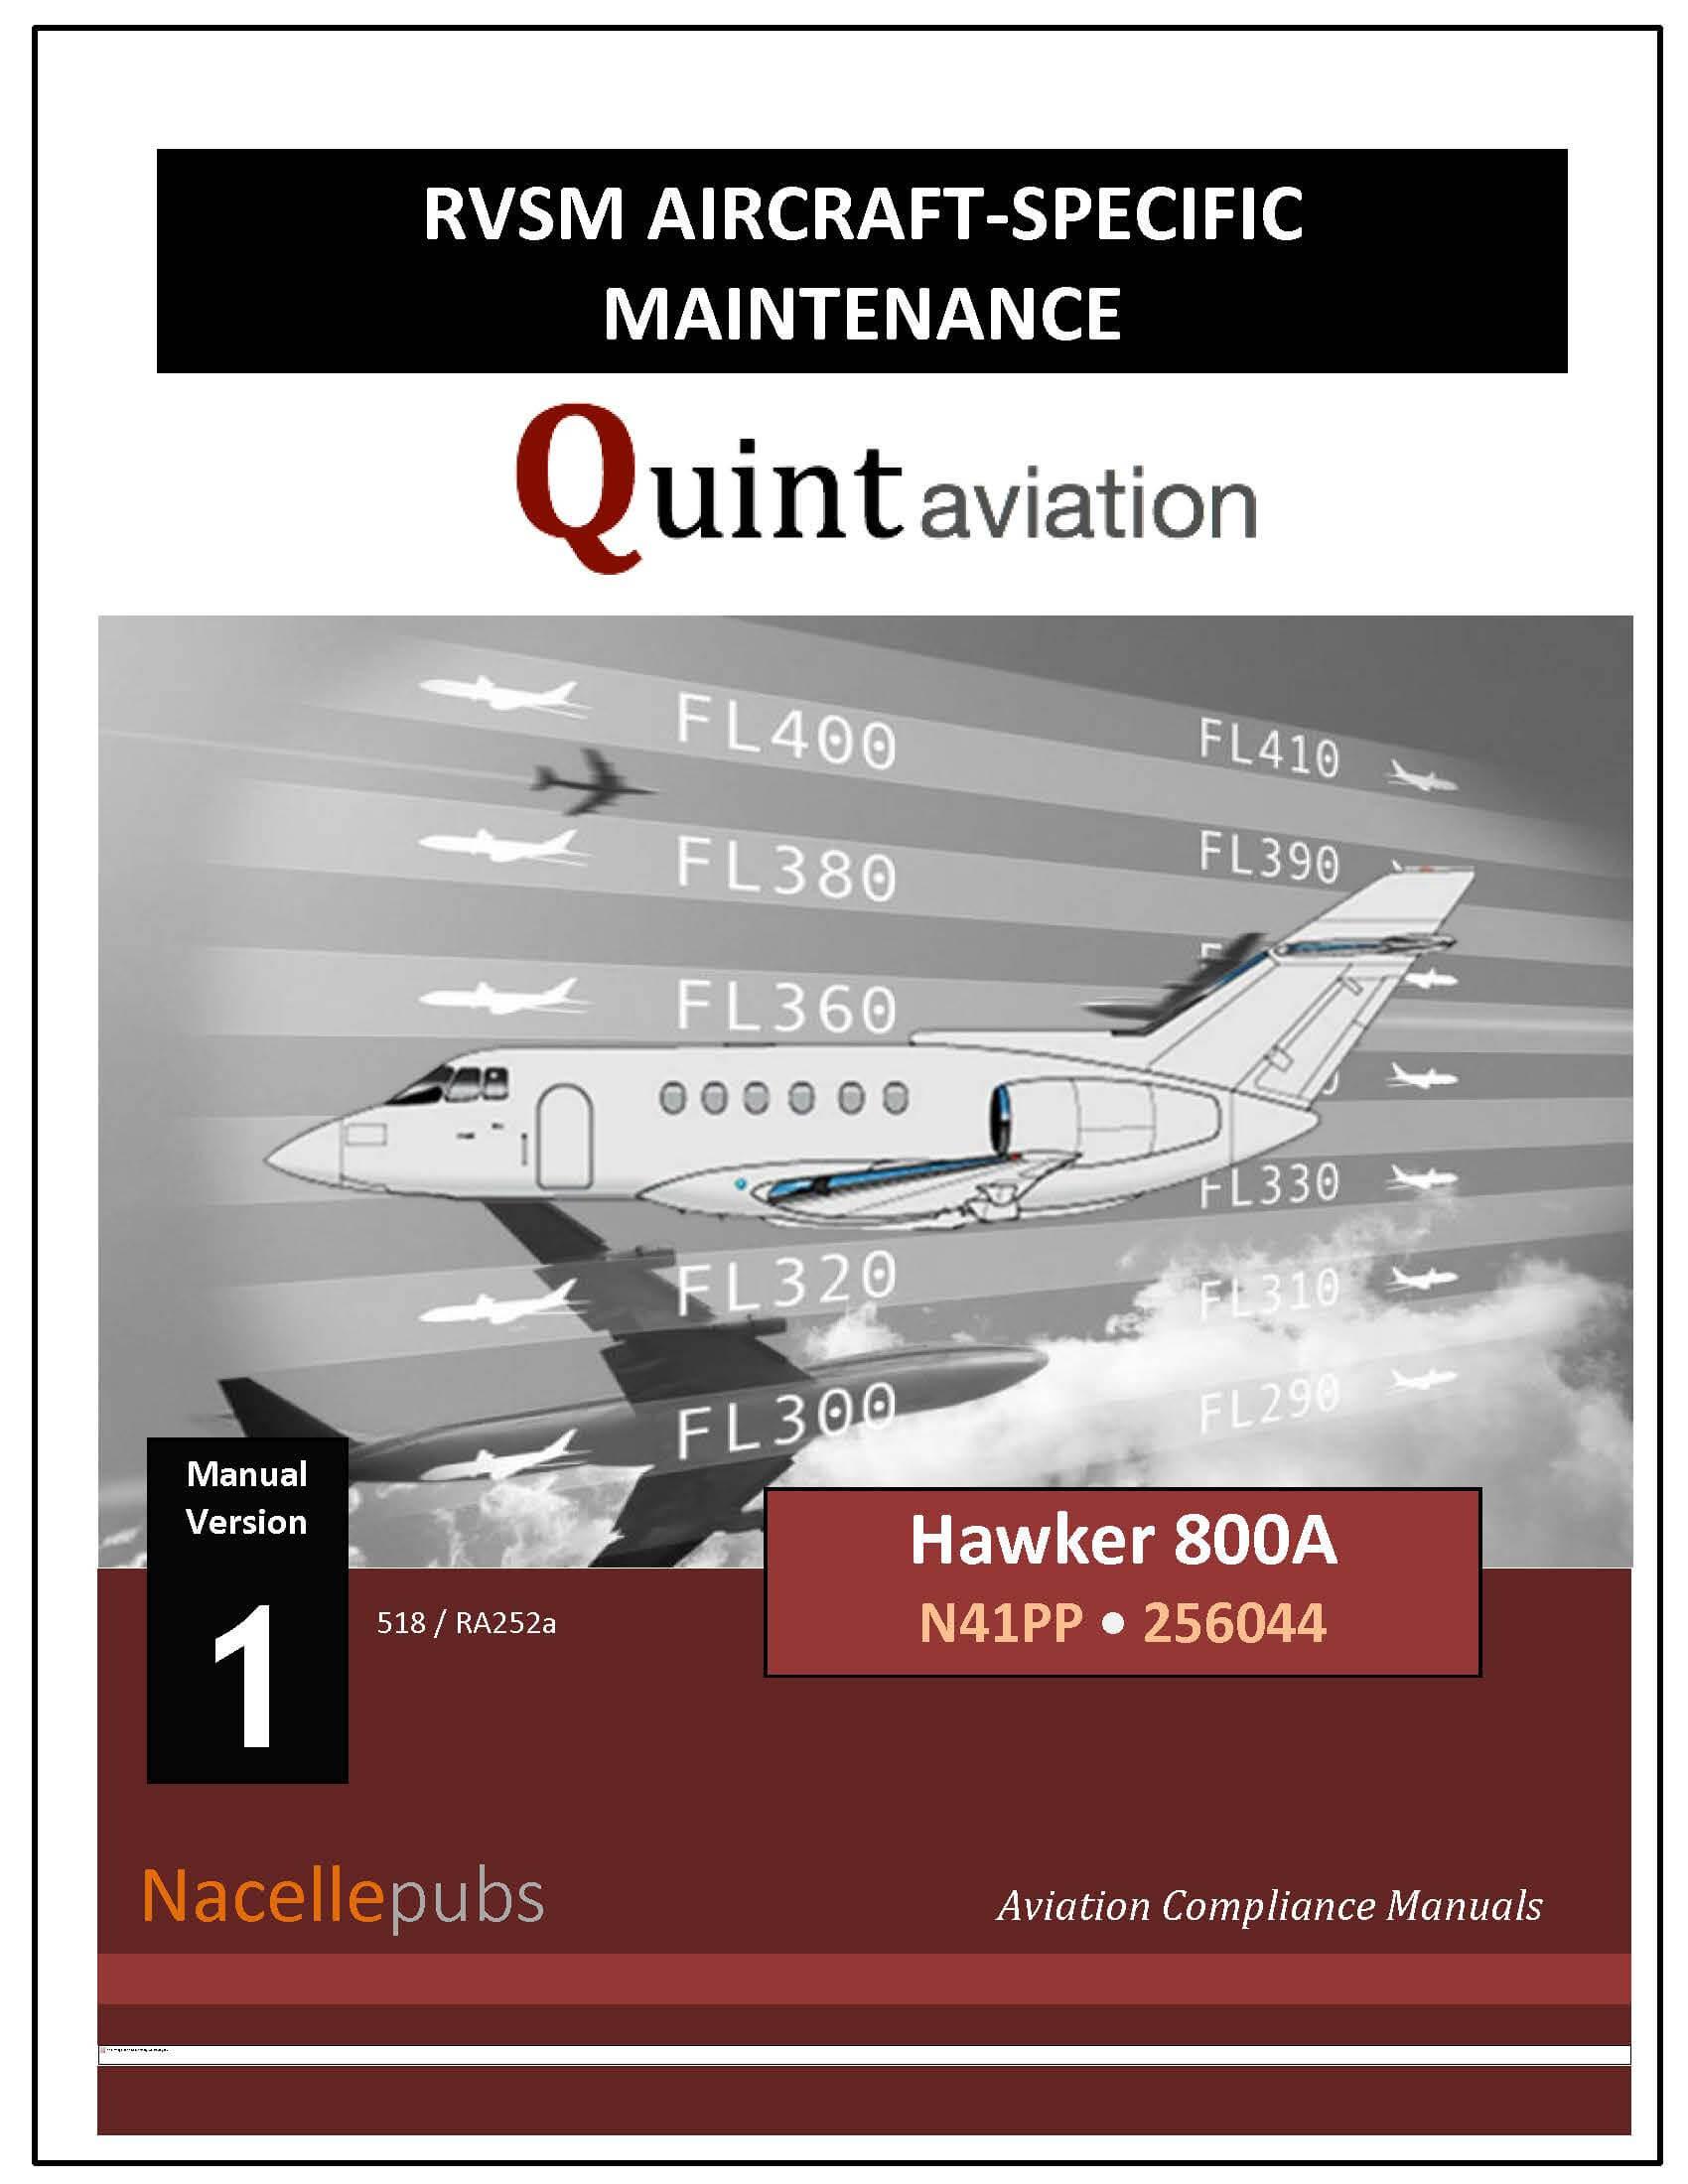 rvsm aircraft specific manual nacellepubs rh nacellepubs aero Dispatcher Gifts Dispatcher Gifts